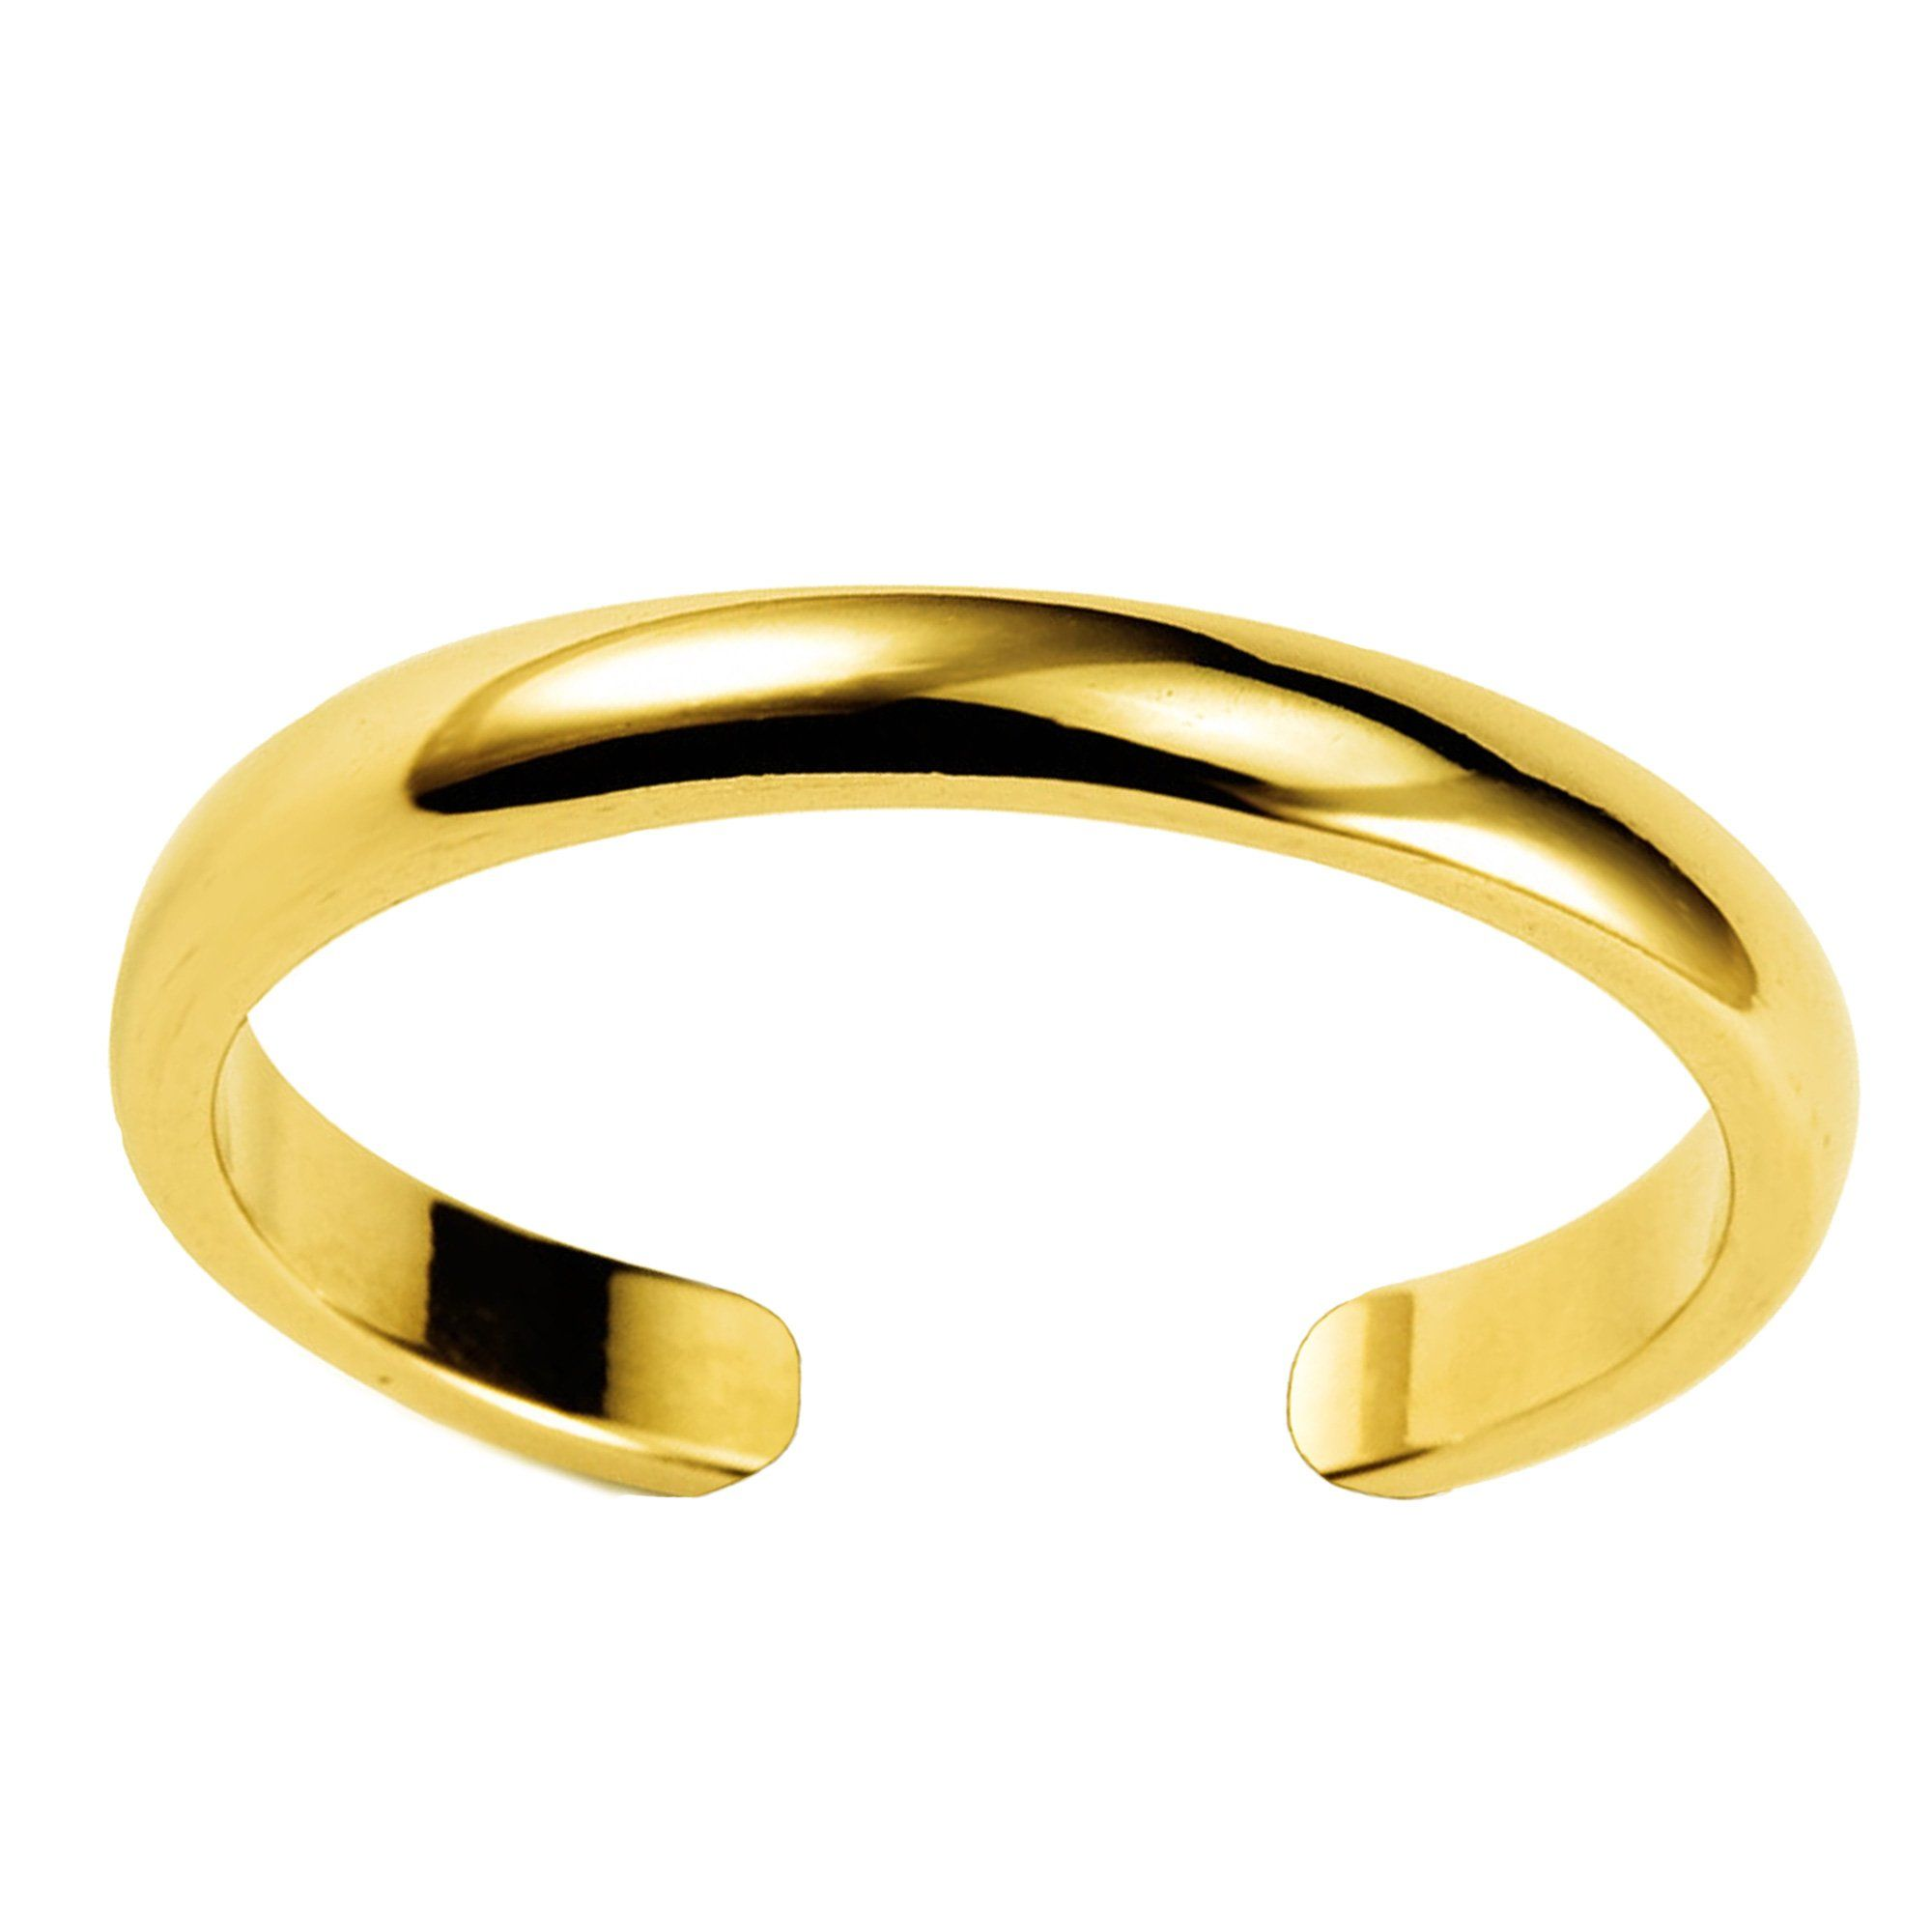 14k Solid White Gold Swirl Toe Ring Body Art Adjustable